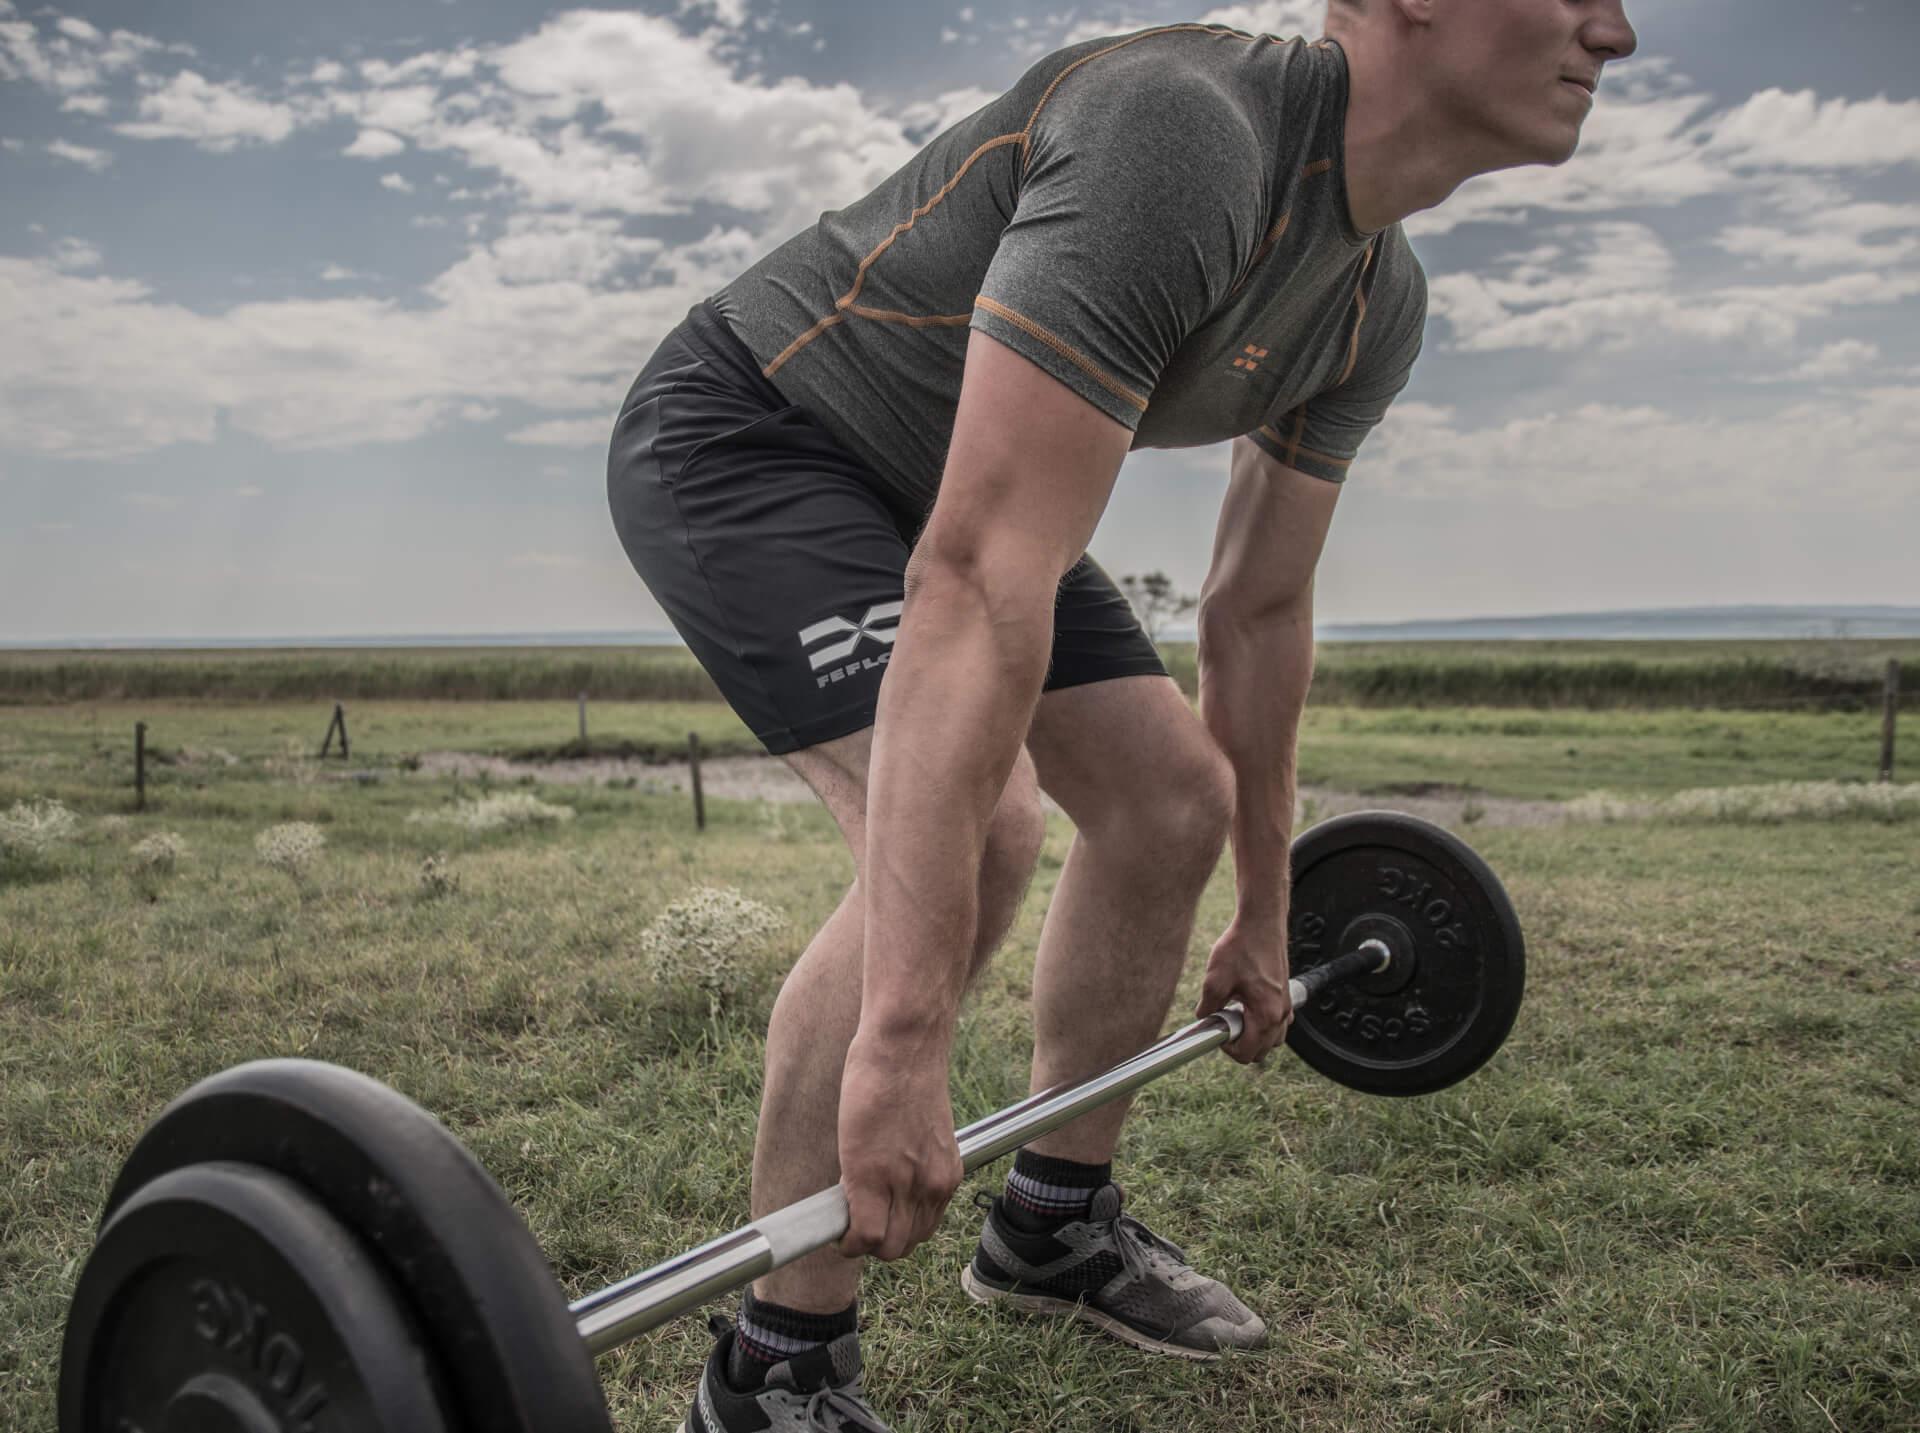 Langhantel-Training am See im FEFLOGX Sportswear Rashguard Compression und der Allrounder-Shorts.